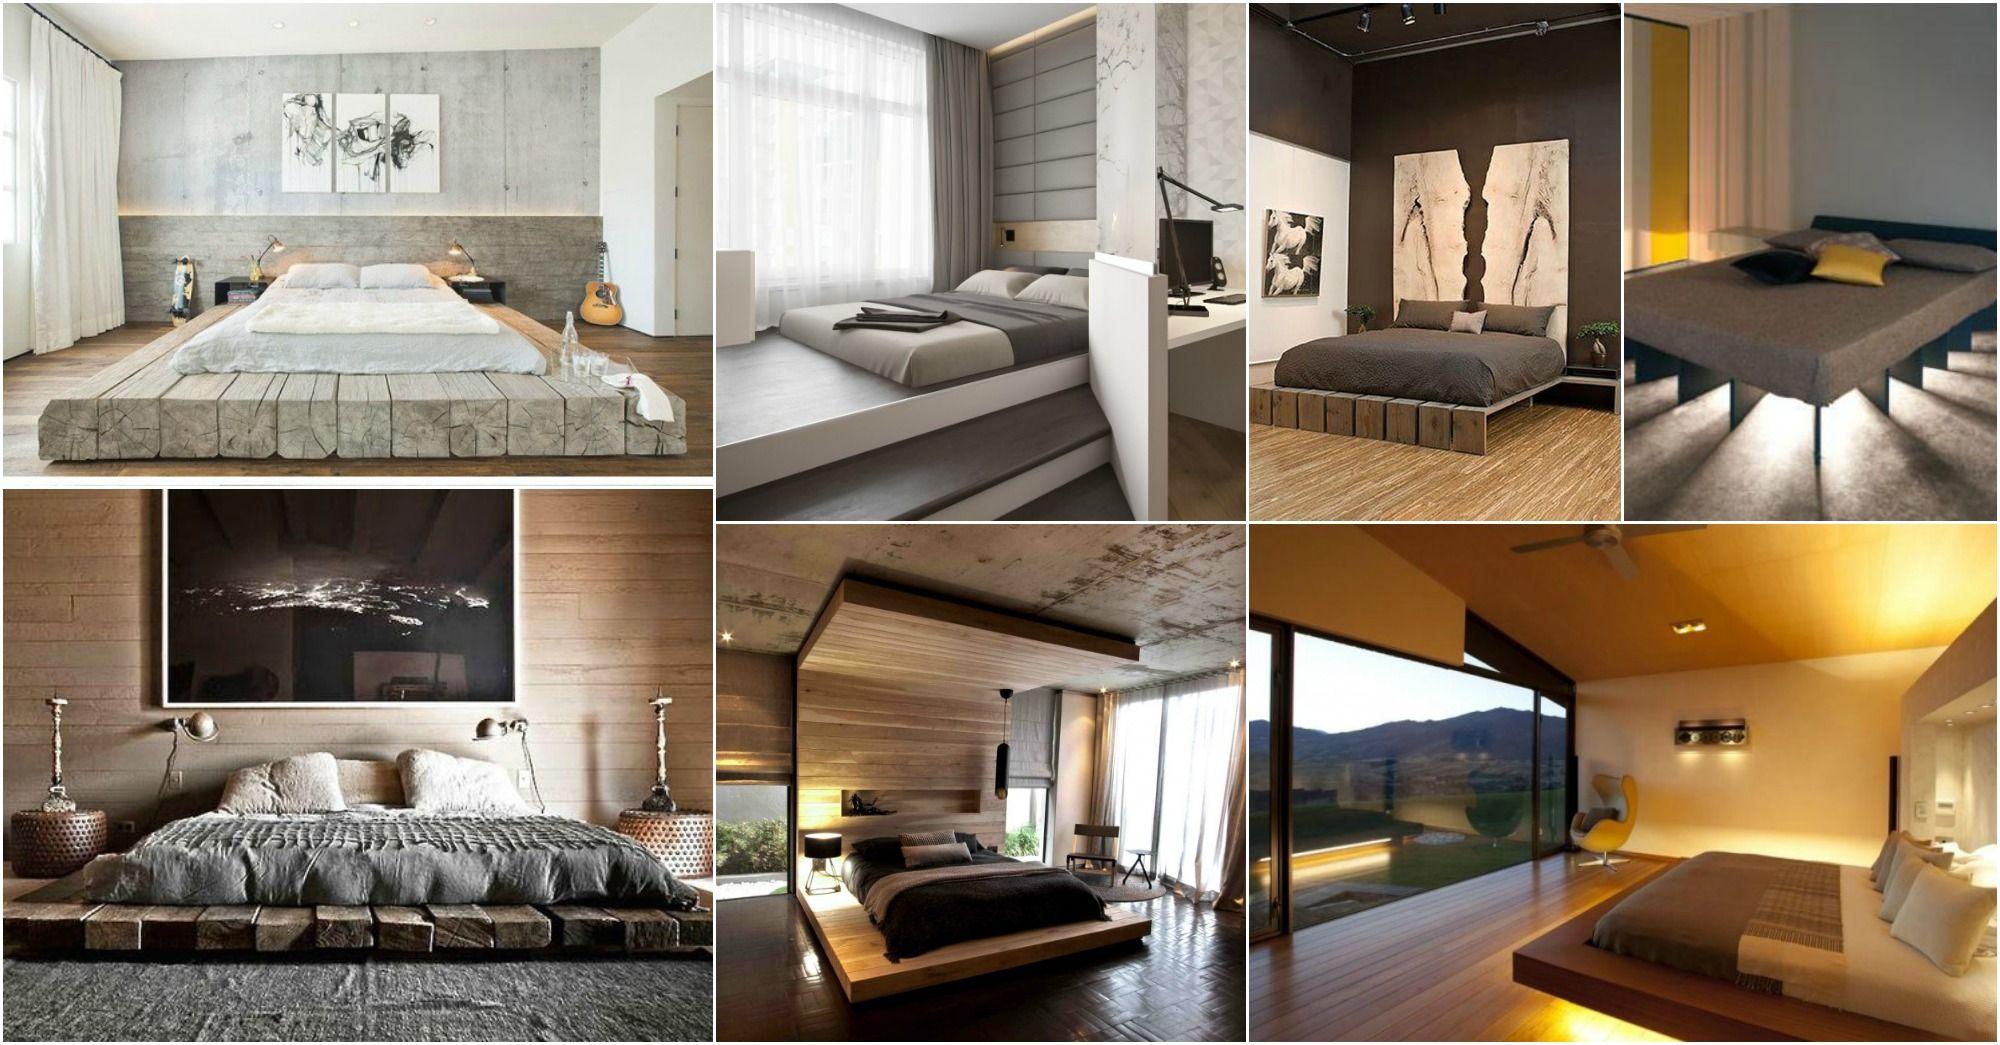 Platform Bed Ideas That Will Steal The Show Bed Bedroom Design Platform Bed